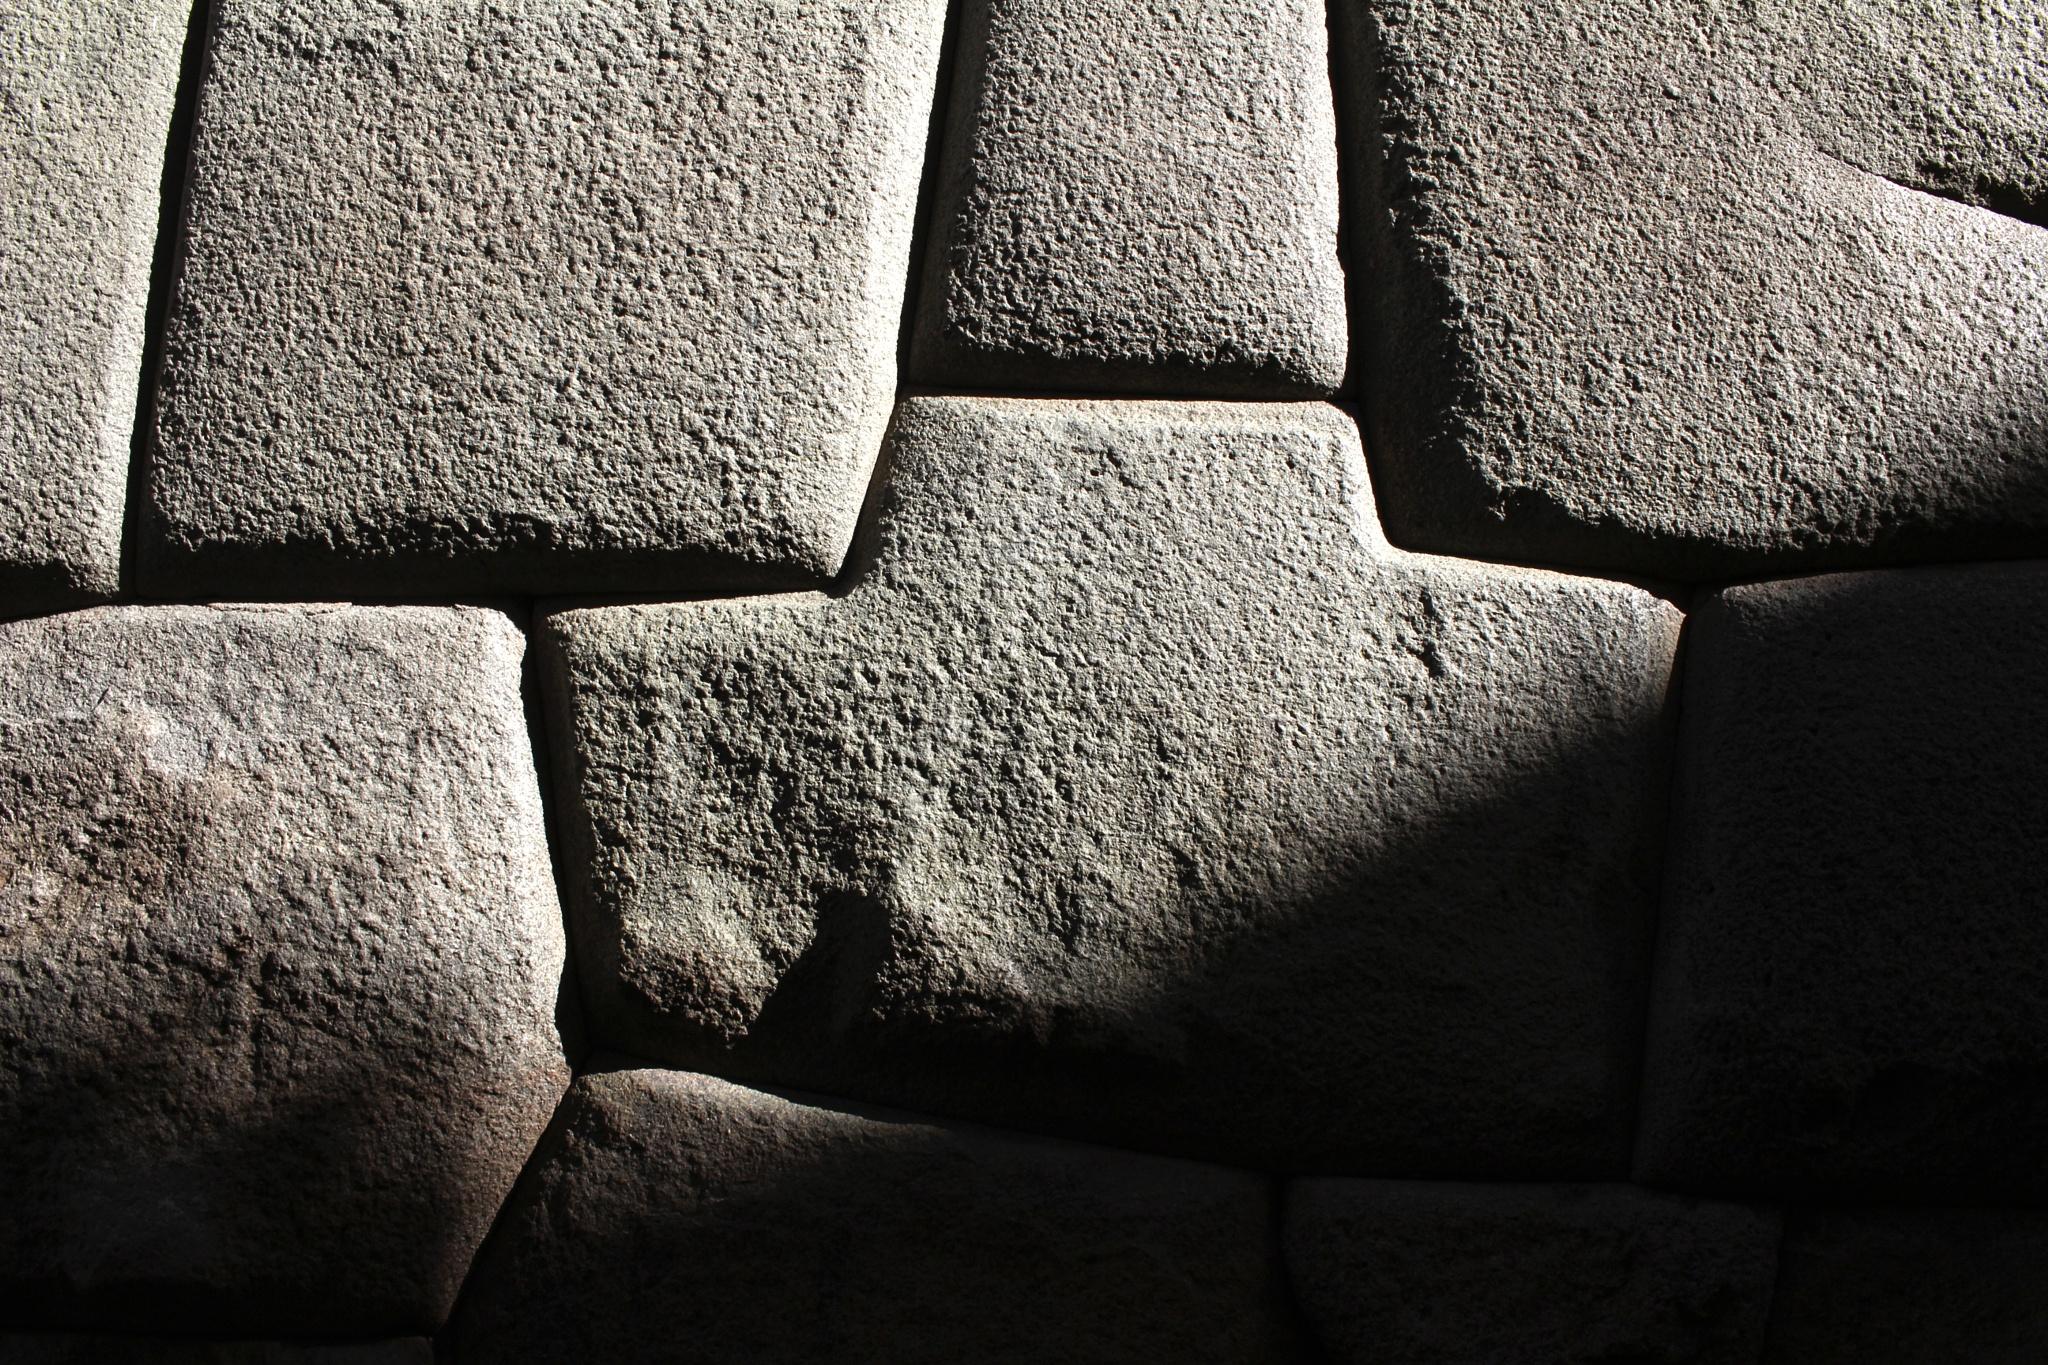 stone puzzle by D.F. Dava